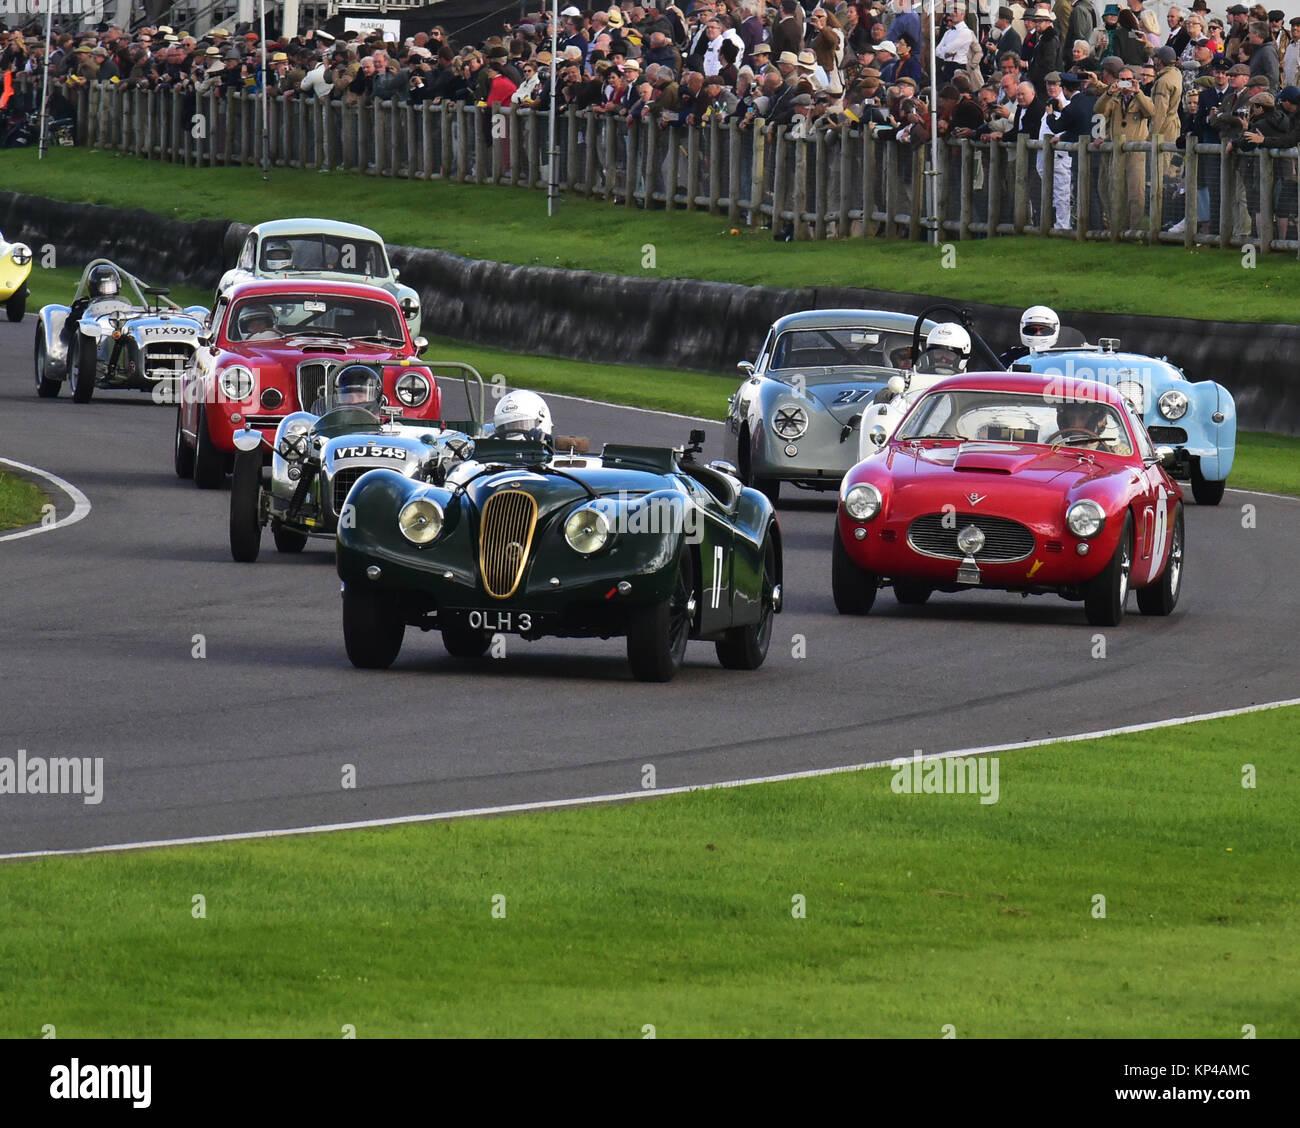 Jaguar Xk120 Coupe: Nick Finburgh, Jaguar XK 120 Roadster, OLH 3, Fordwater